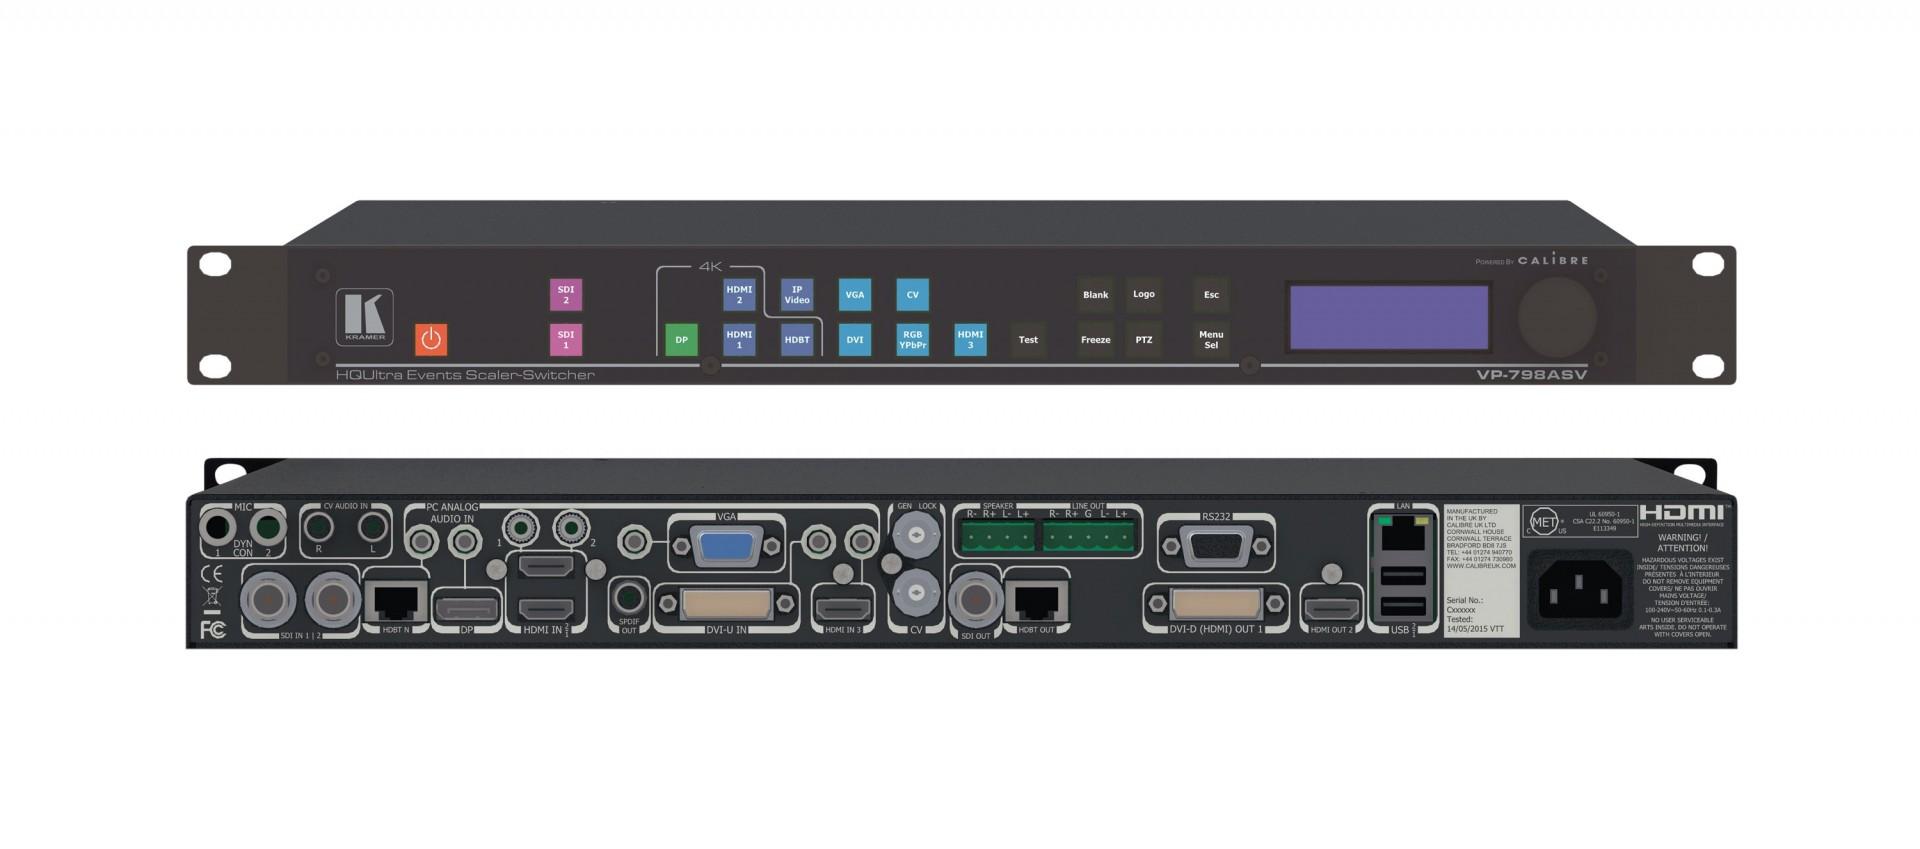 Kramer VP-798ASV -12–Input 4K60 4:2:0 Presentation Switcher/Scaler